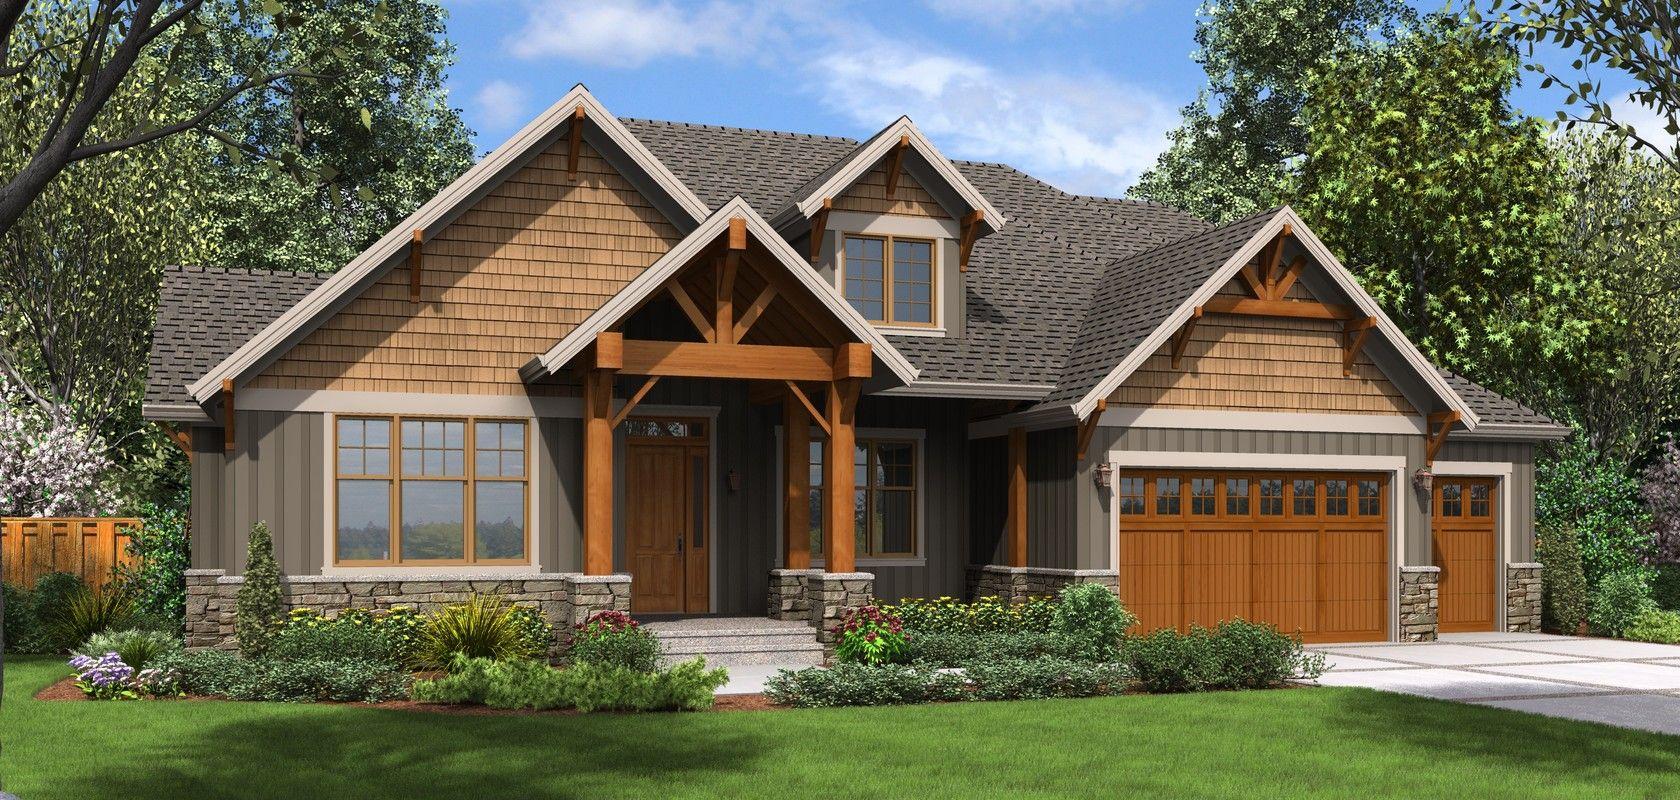 Mascord Plan 23111 The Edgefield  Dream Home  Pinterest